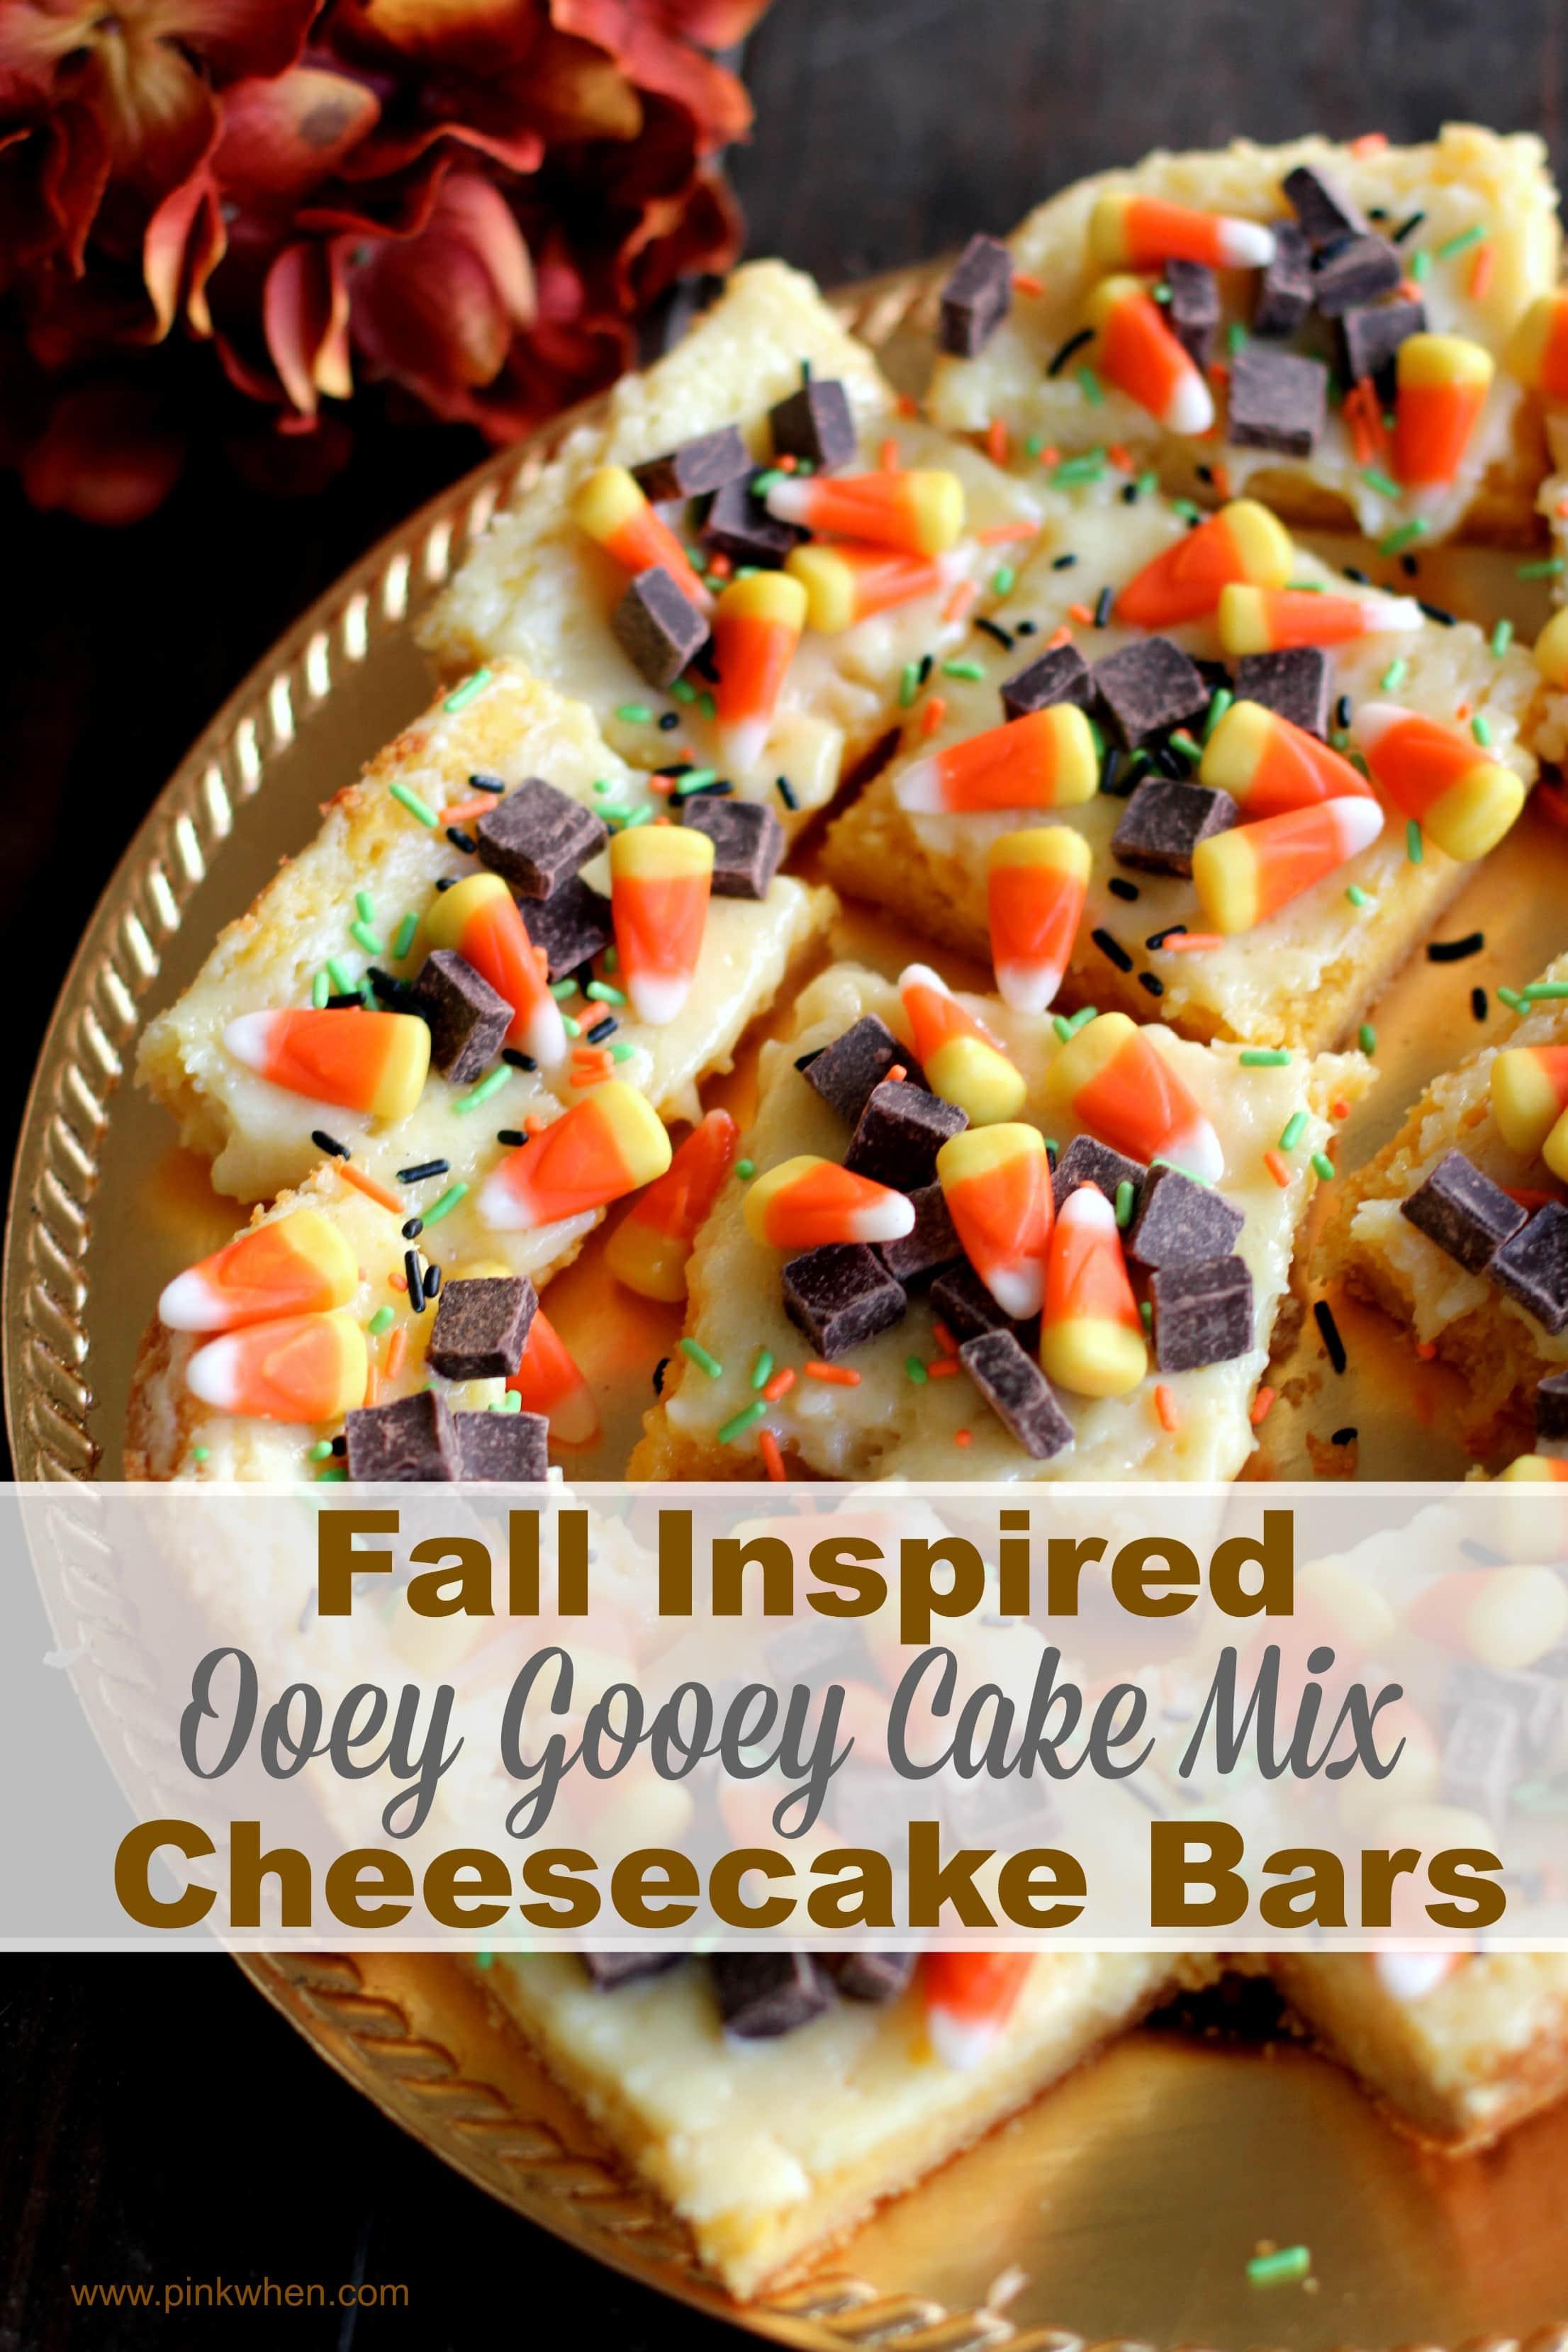 Fall Inspired Ooey Gooey Cake Mix Cheesecake Bars via PinkWhen.com